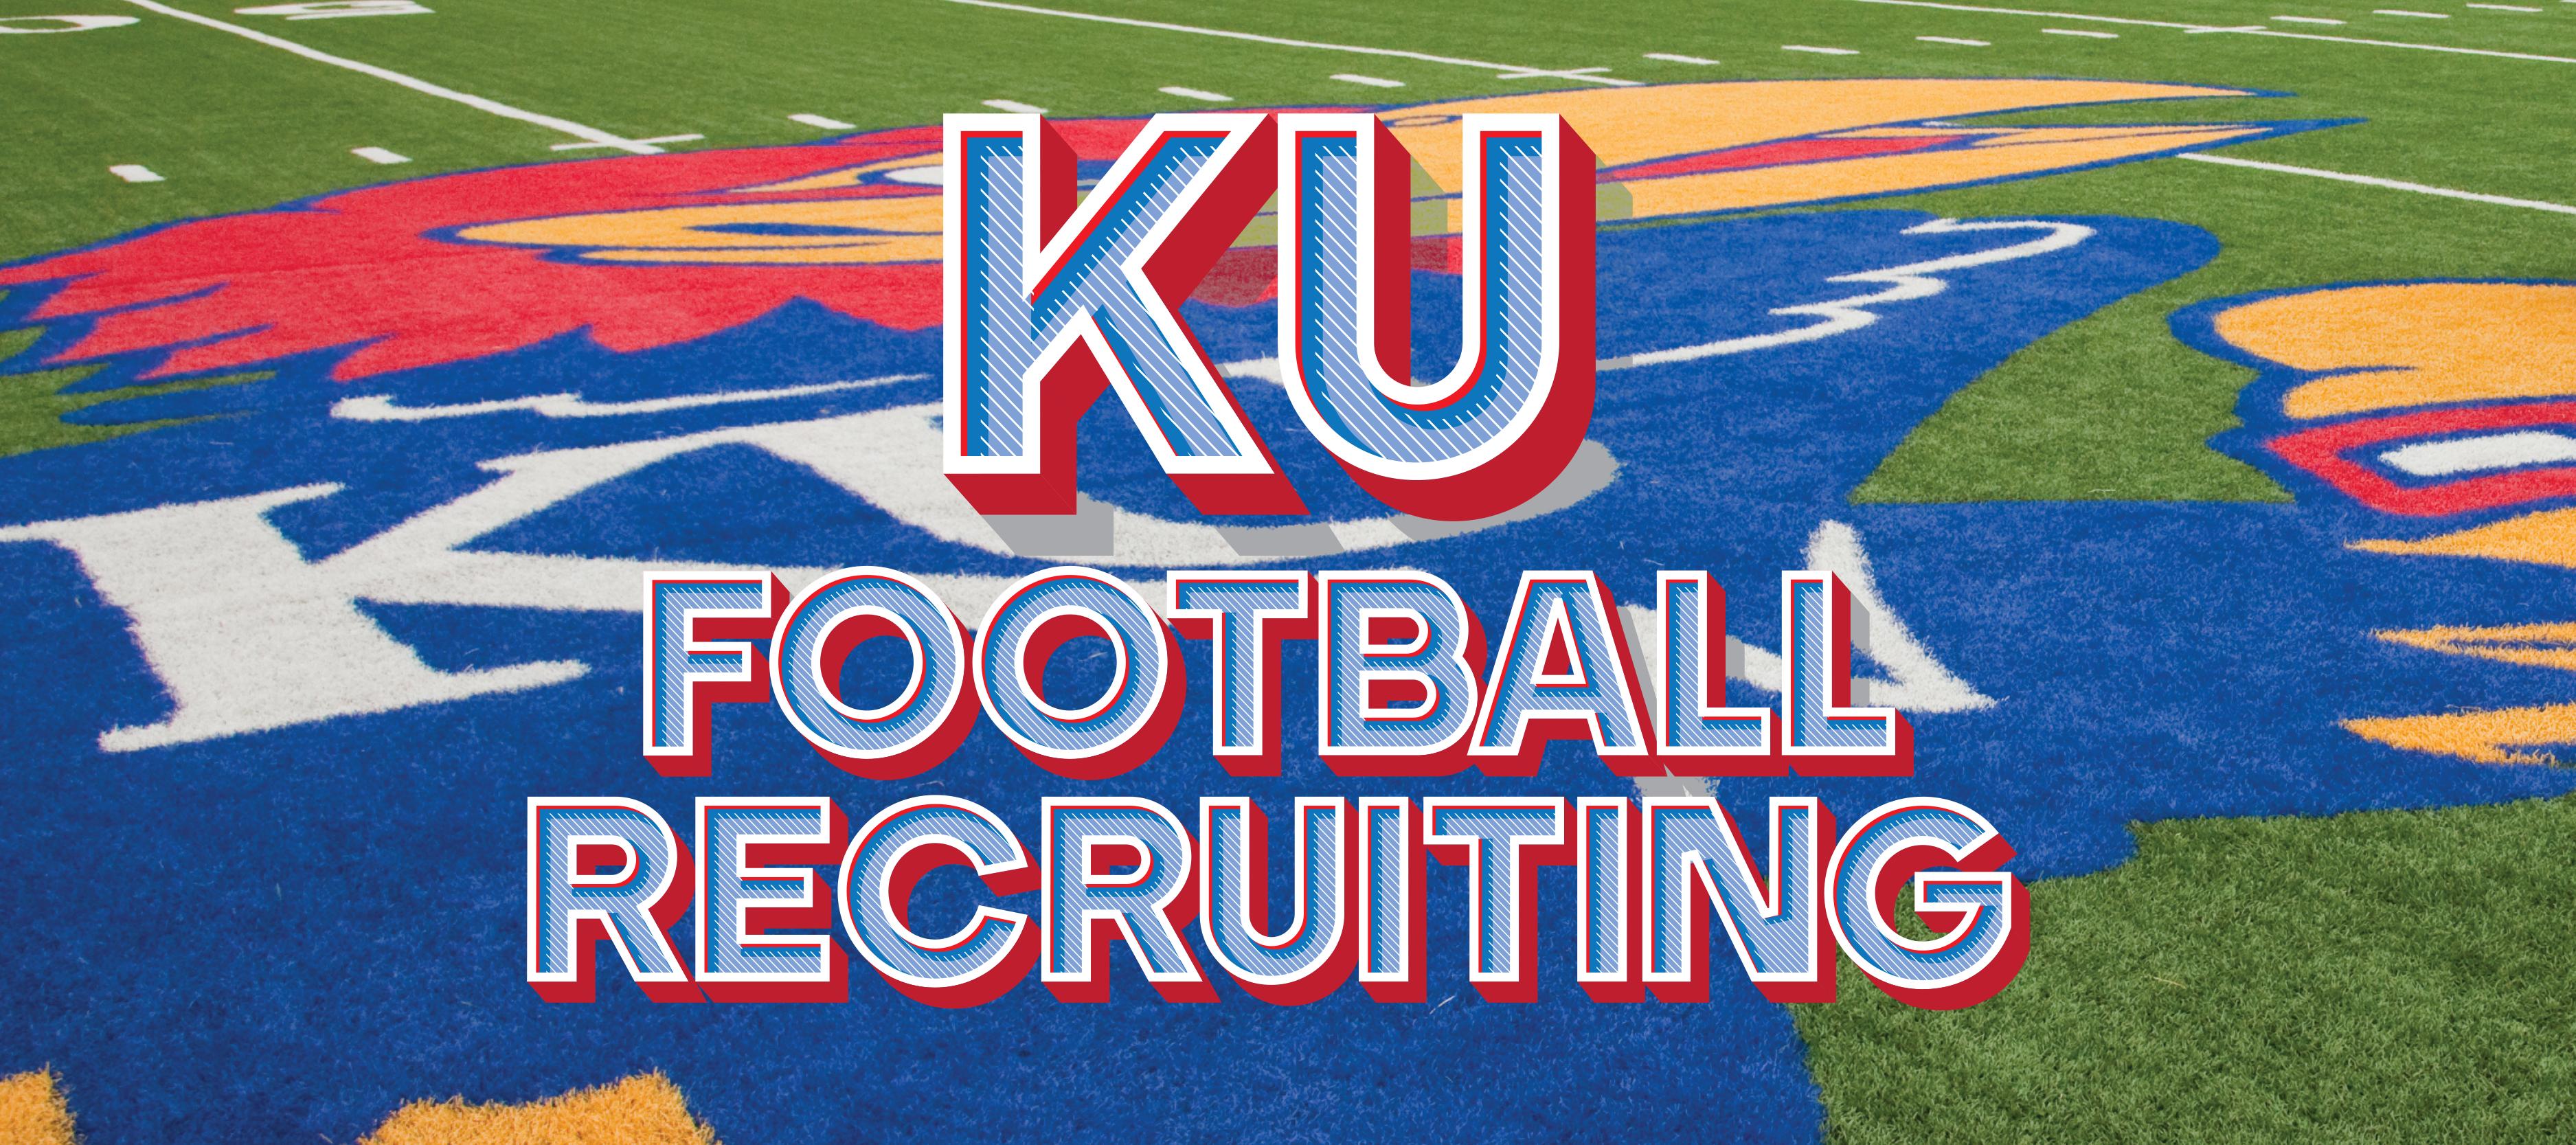 Ku Football News Sports Jobs Lawrence Journal World News